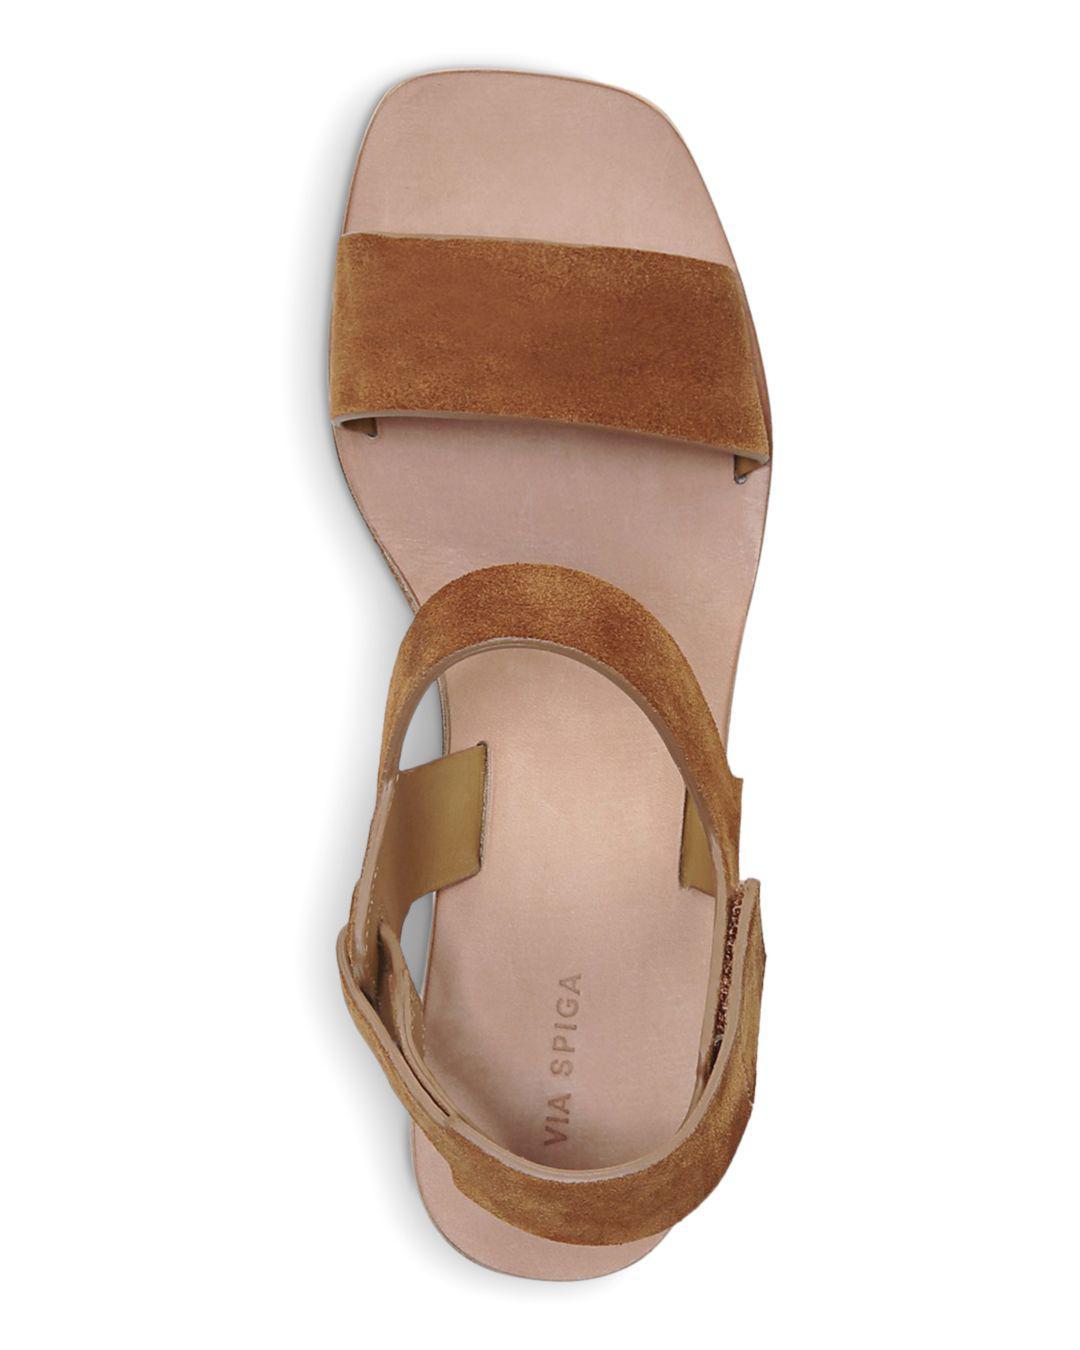 7272d8fc388 Via Spiga - Brown Women s Kamille Suede Block Heel Ankle Strap Sandals -  Lyst. View fullscreen